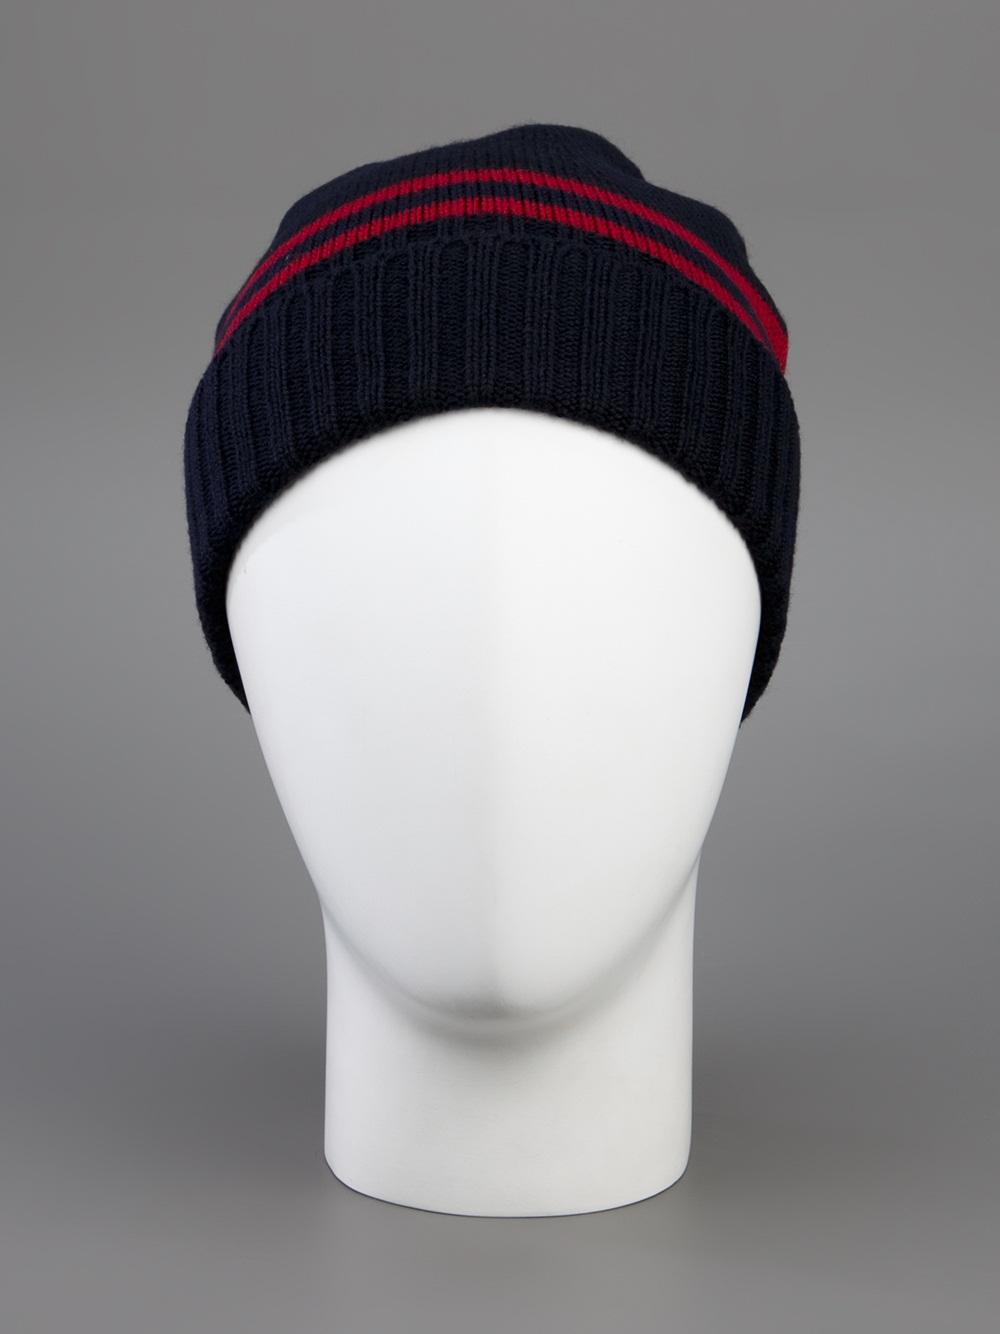 635ed6fa147db Gucci Beanie Hat in Blue for Men - Lyst